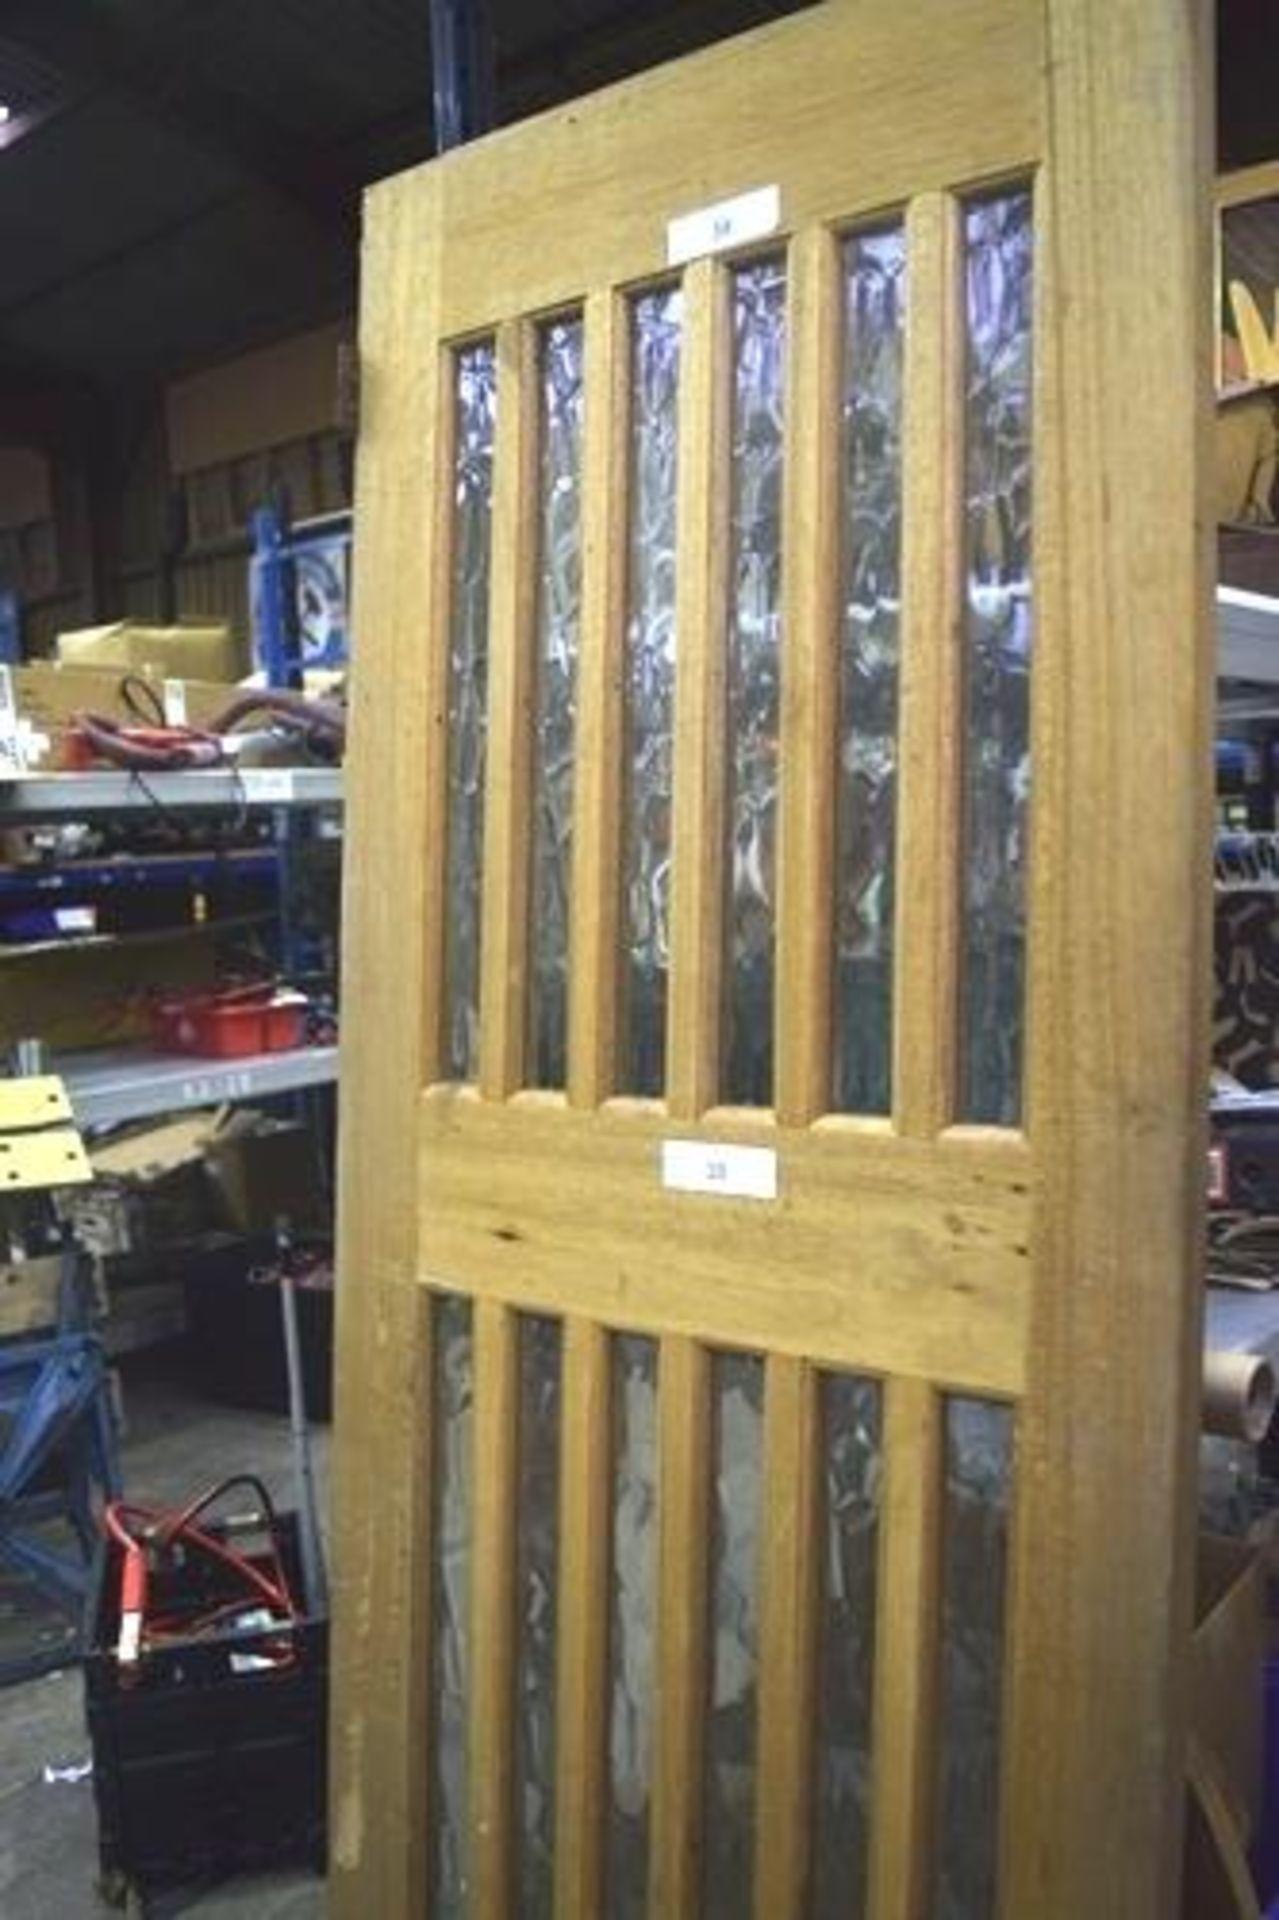 Lot 38 - Solid oak framed 12 panel door, 76cm(W) x 198cm(H) x 4cm(D) - Second-hand (GS18)